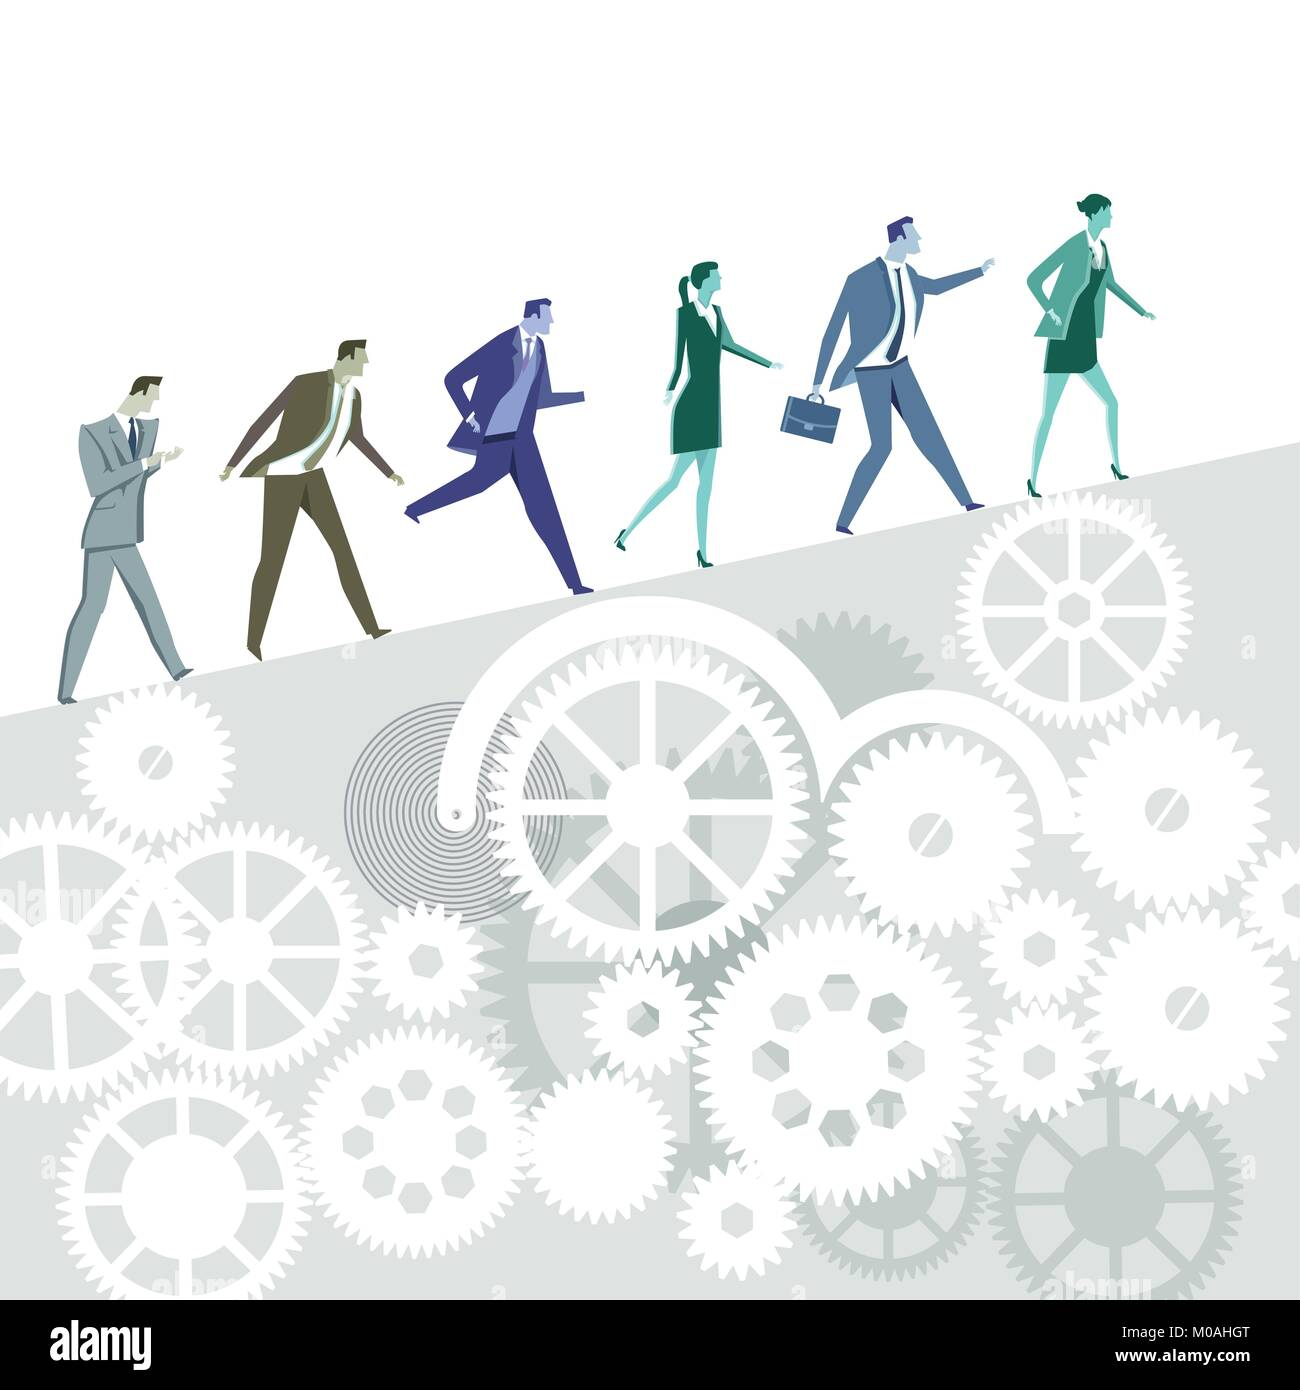 Business career symbolic illustration - Stock Vector